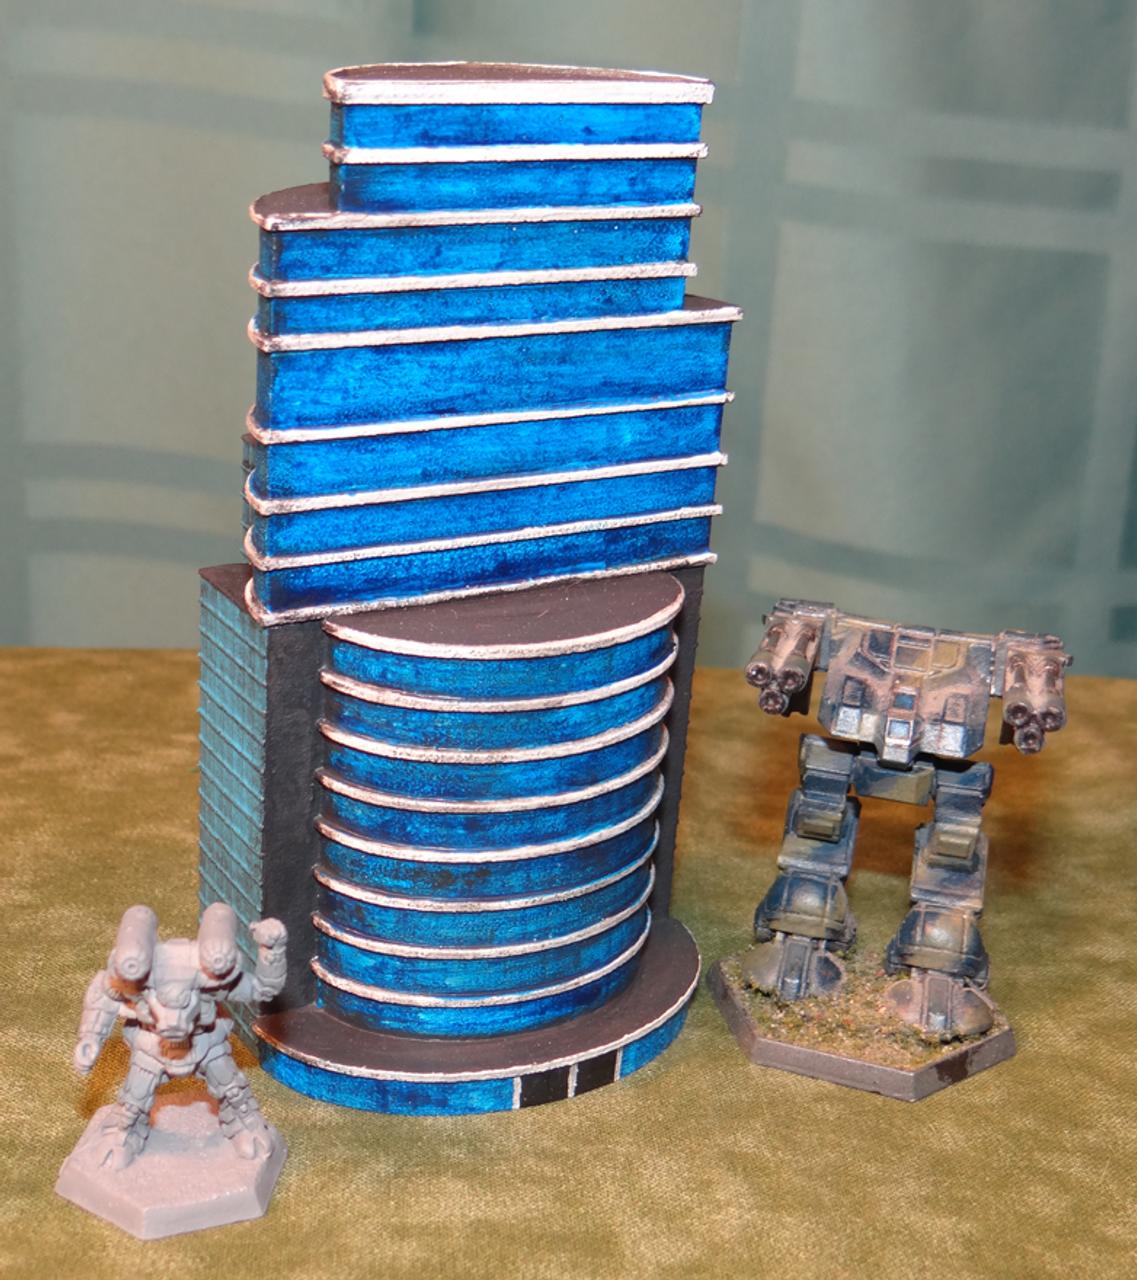 6mm Battletech Office building shown with Mechs